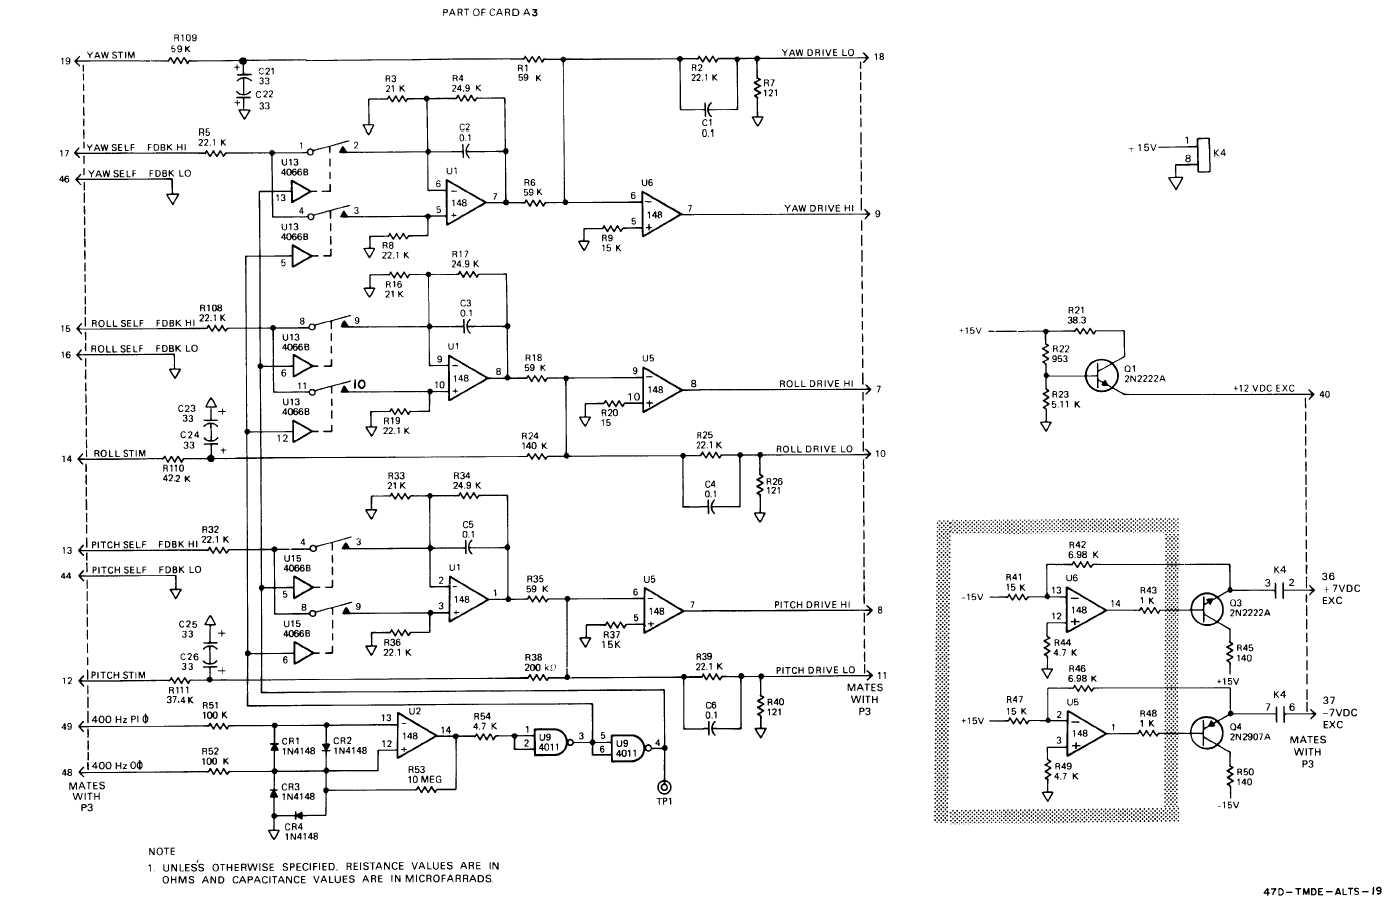 marquis spa parts diagram 1963 chevy truck wiring vita manual elsavadorla